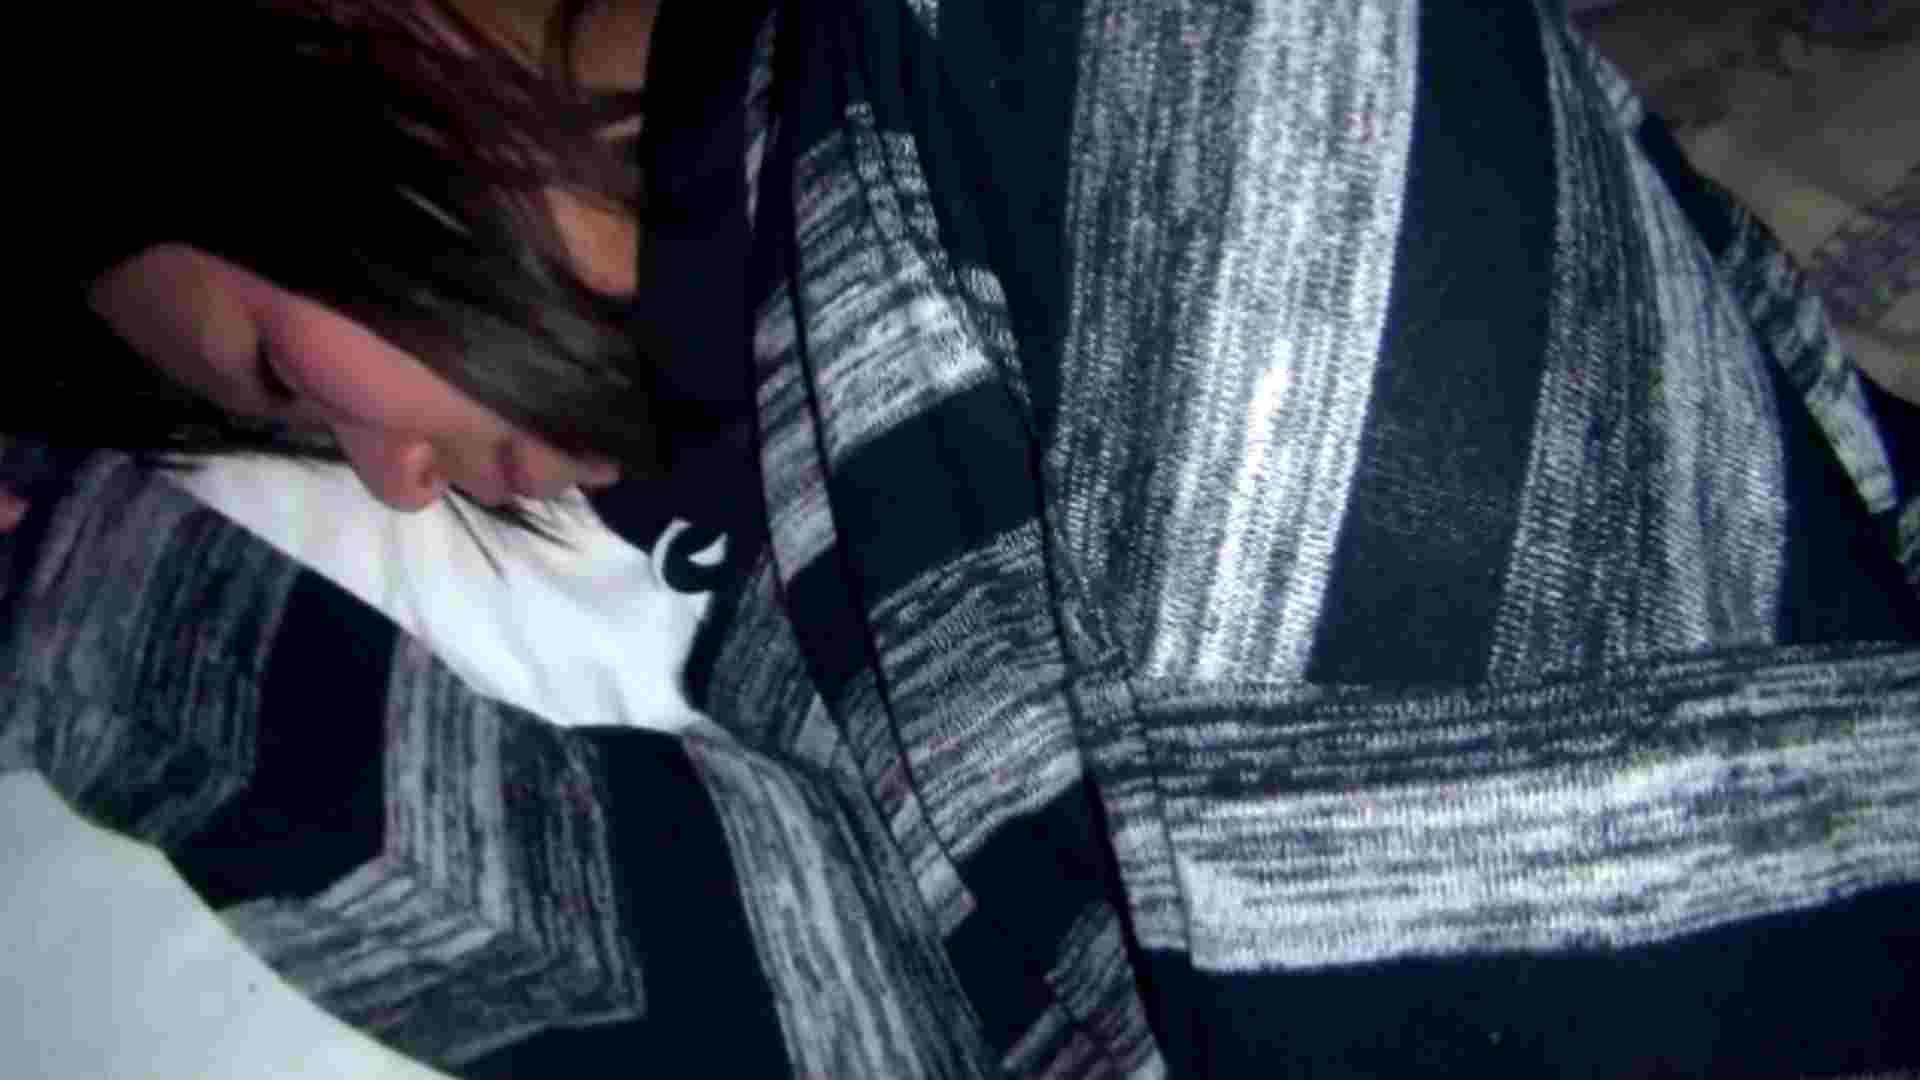 vol.34 【AIちゃん】 黒髪19歳 夏休みのプチ家出中 1回目 いじくり  68画像 50